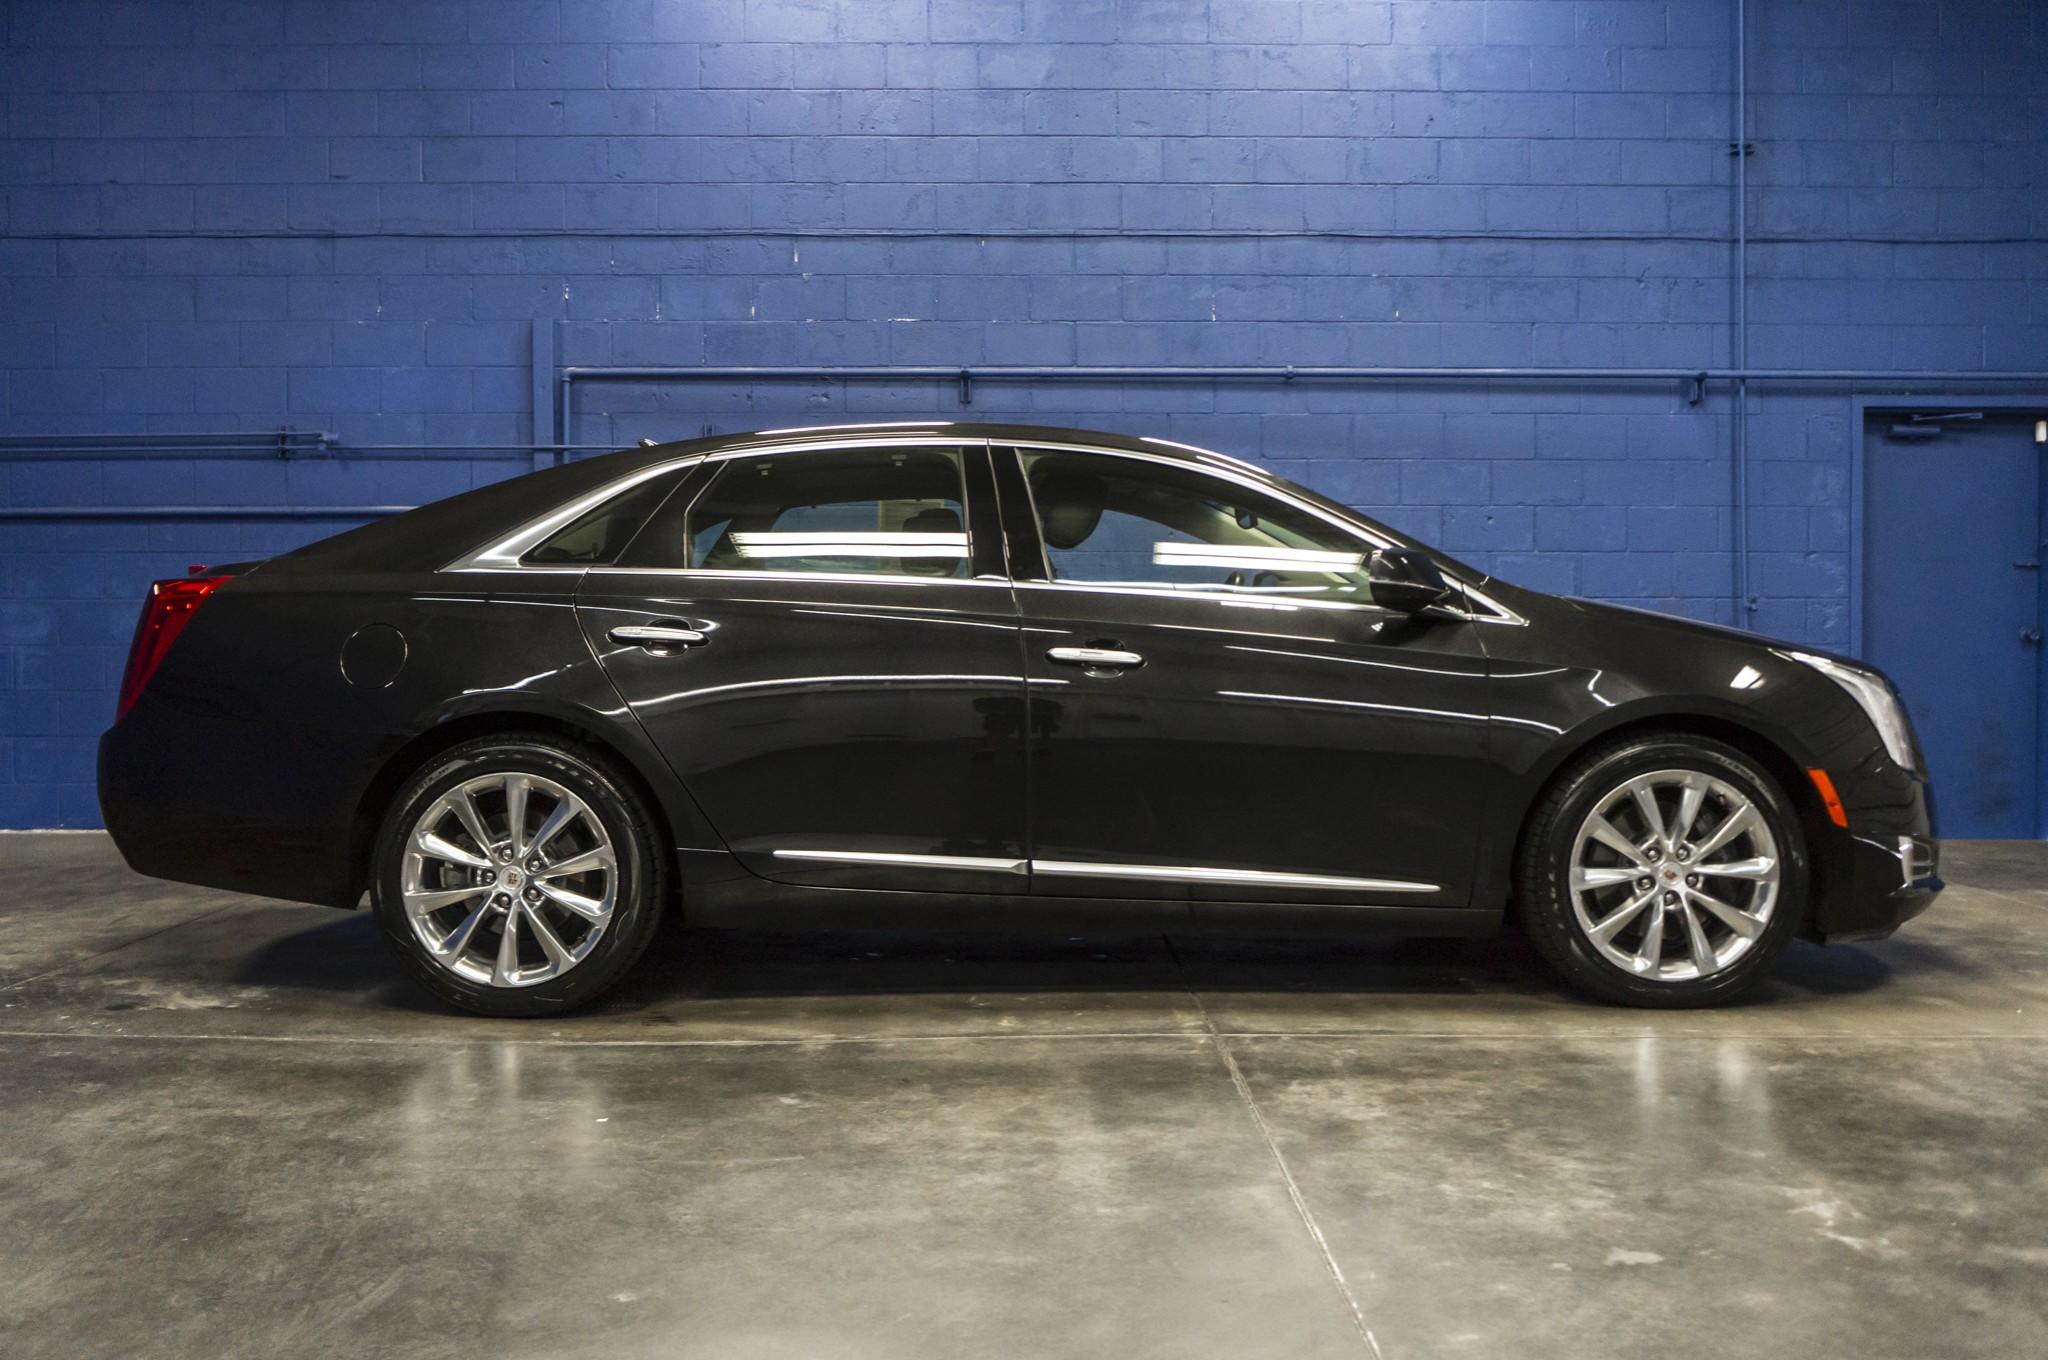 Used 2013 Cadillac Xts Premium Awd Sedan For Sale 33801